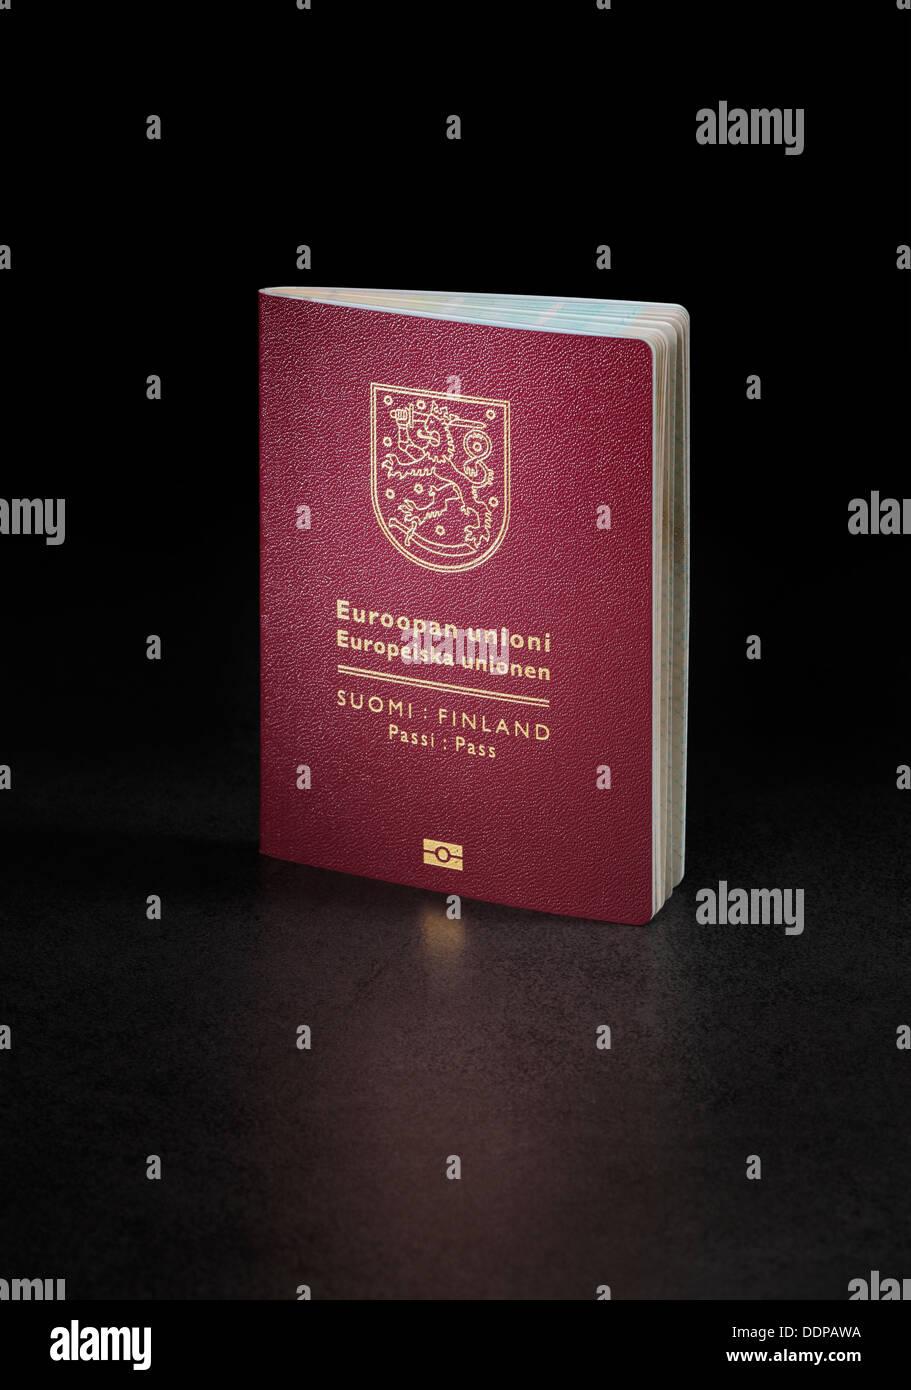 Finnish (Finland) passport. This is the new (2013) design of the passport. - Stock Image